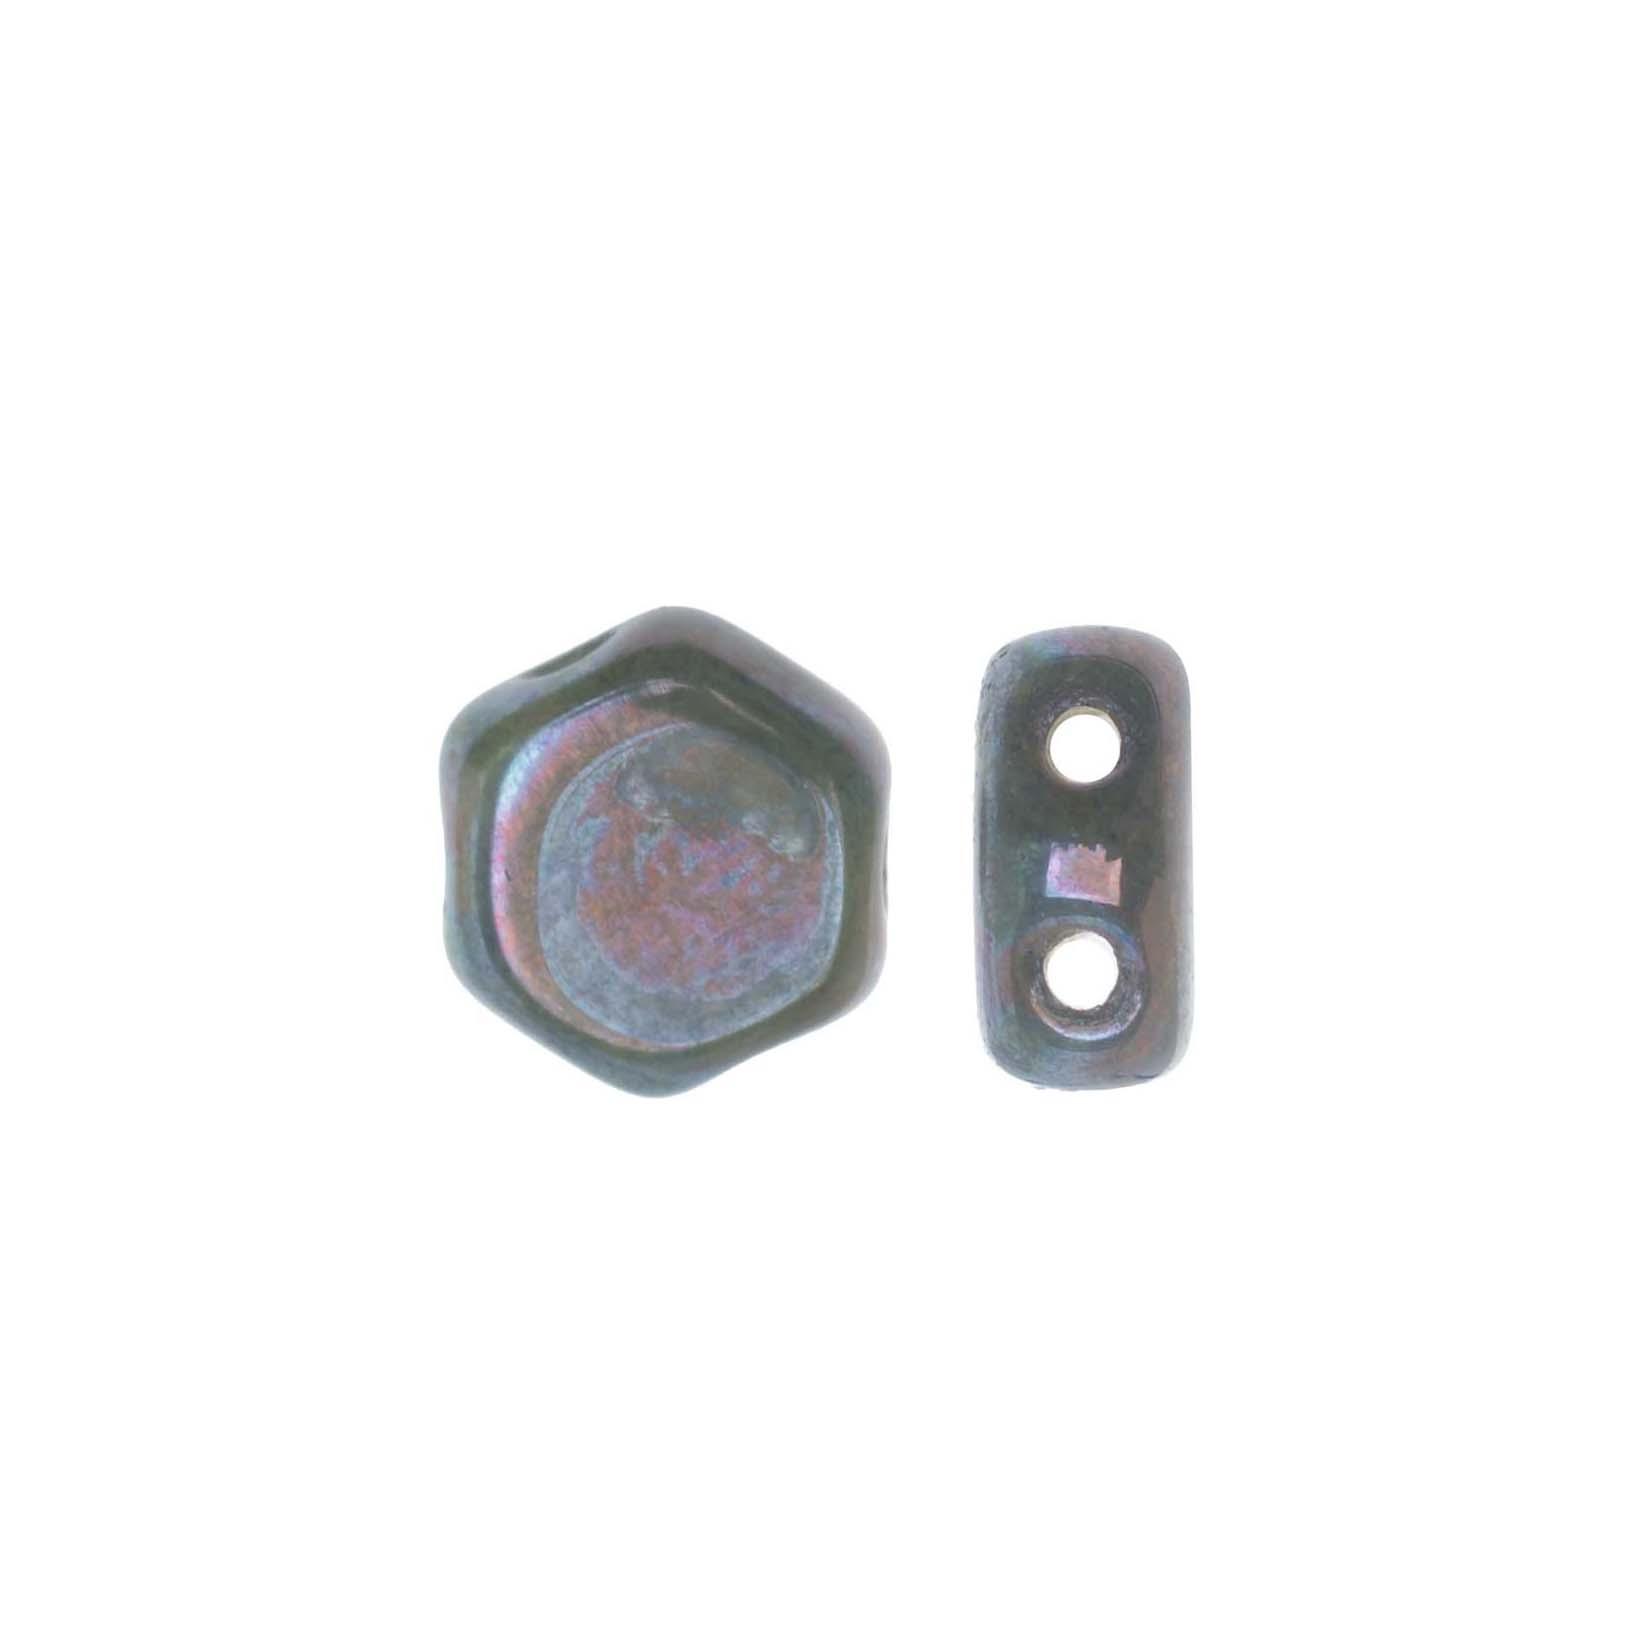 Final Sale - Czech Glass Honeycomb Beads, 2-Hole Hexagon 6mm, 30 Pieces, Hodge Podge Seafoam Nebula